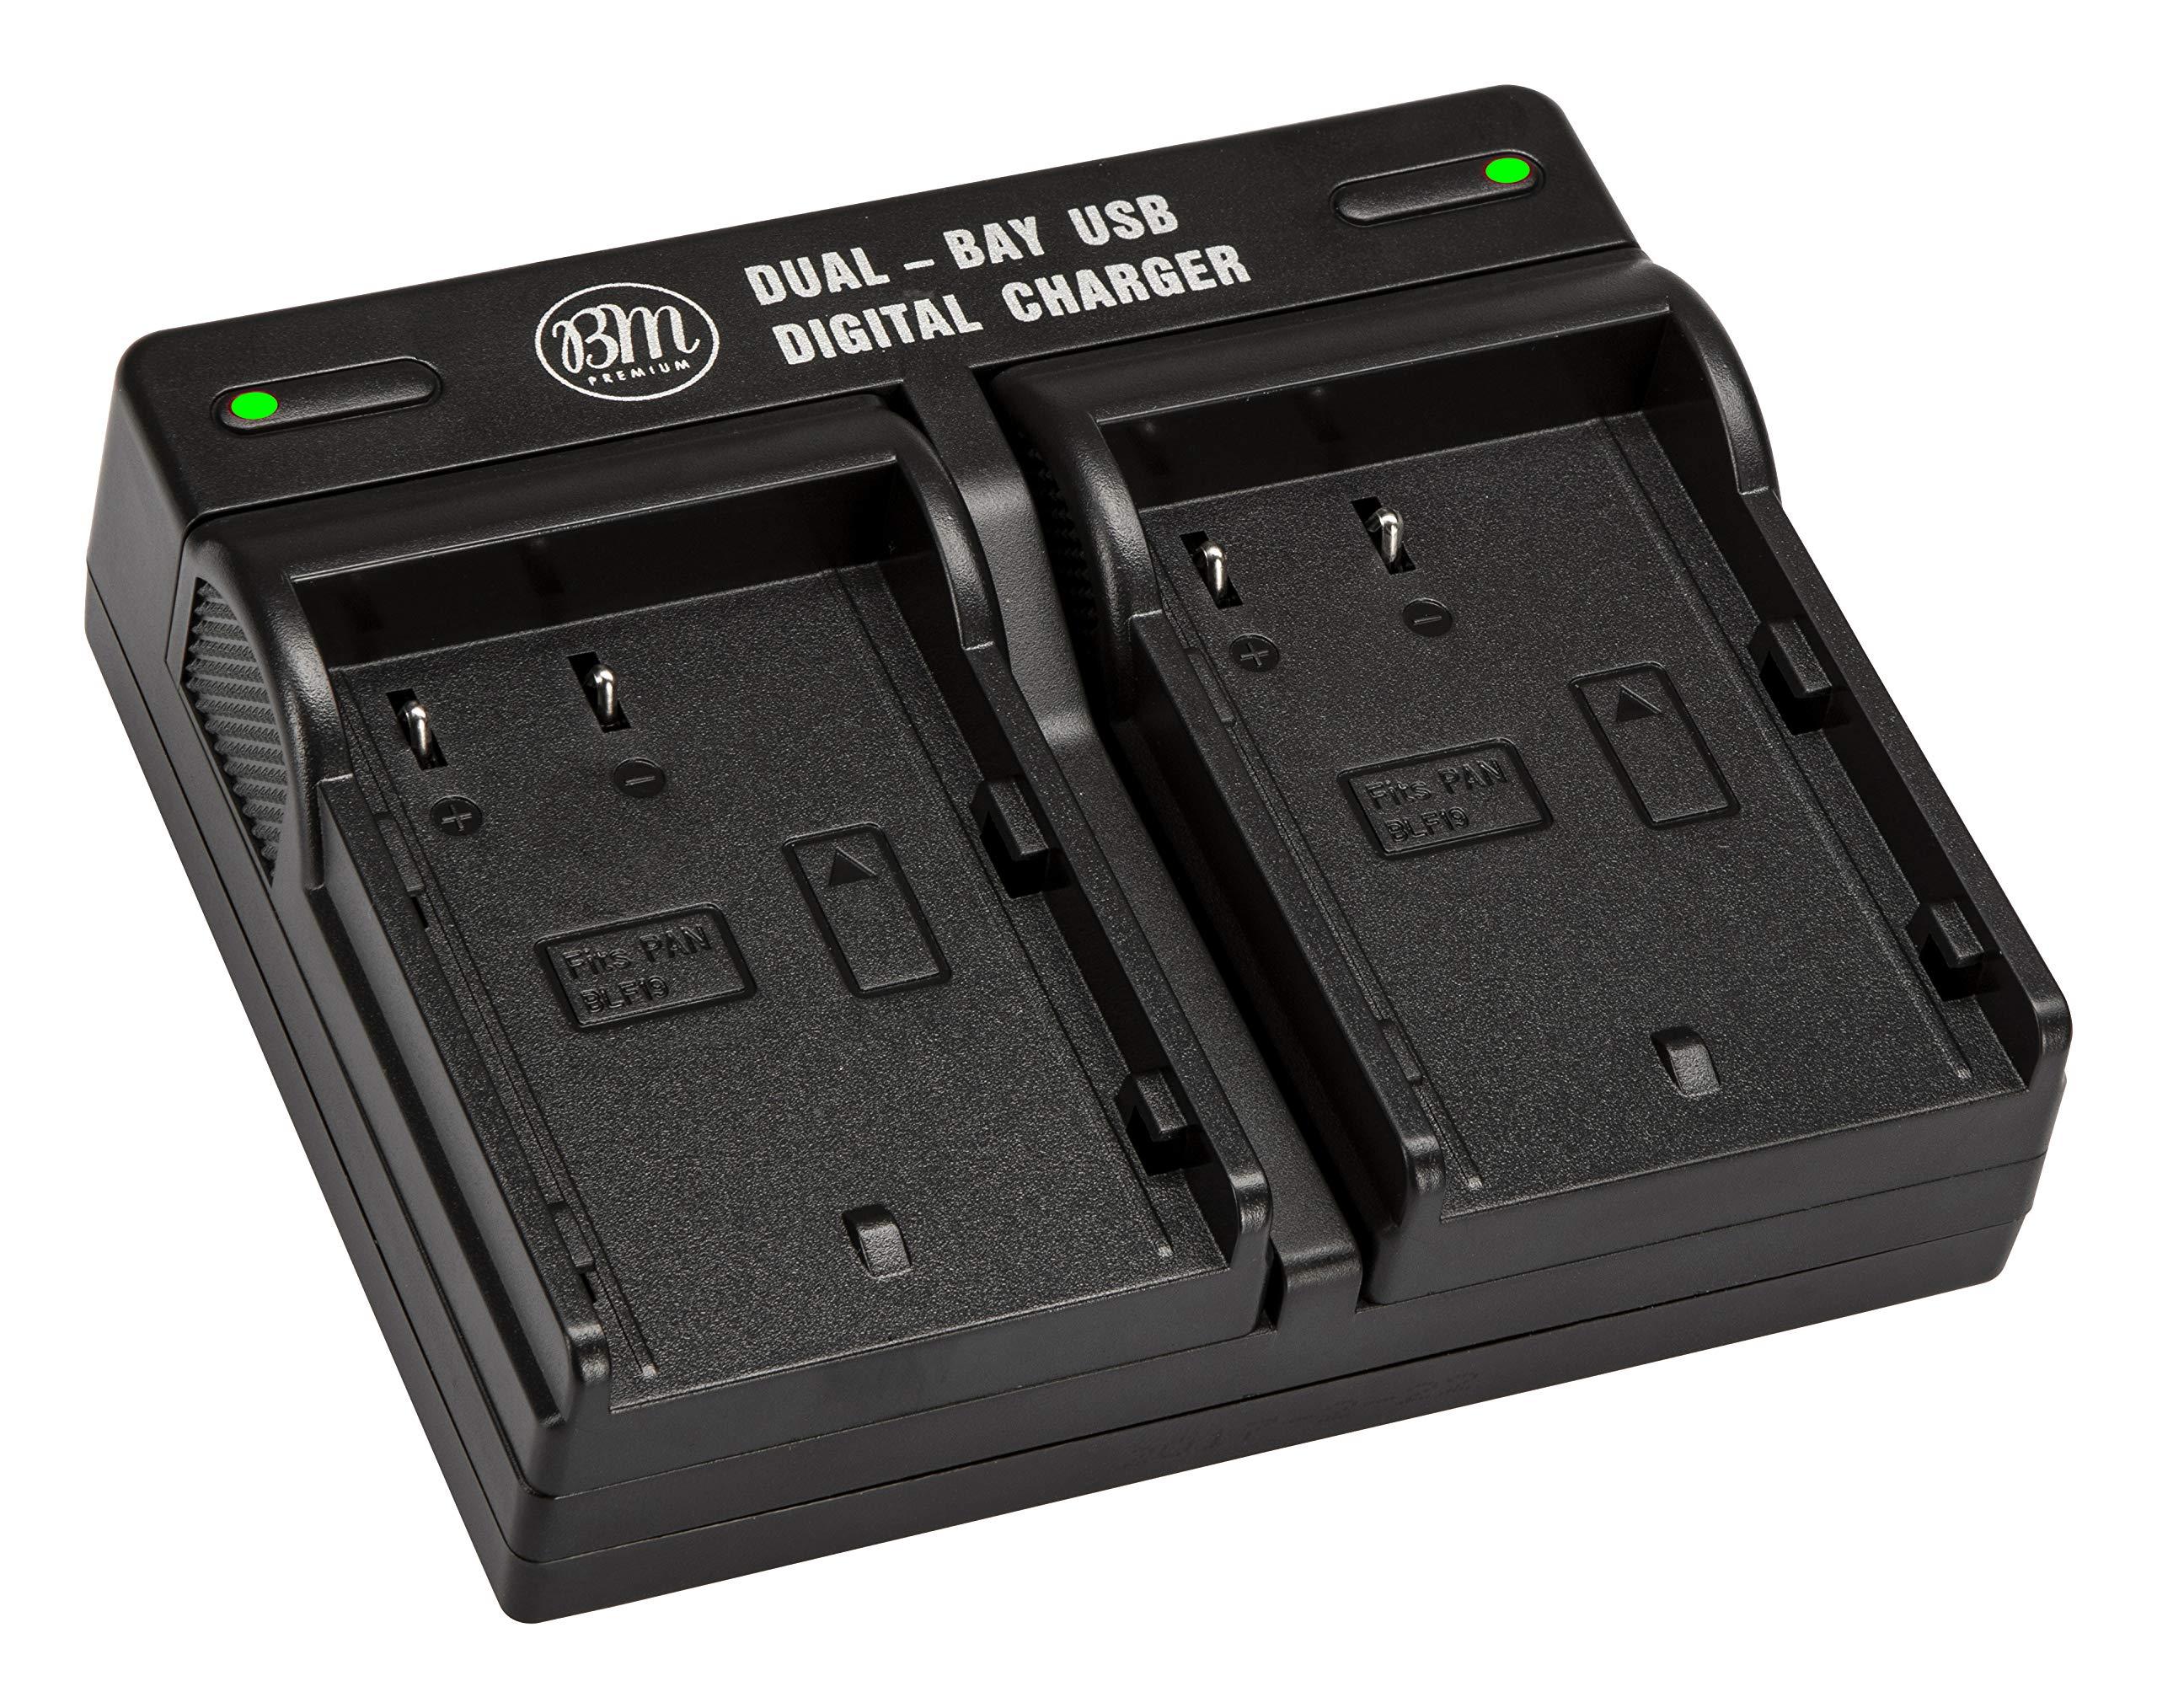 BM Premium DMW-BLF19, DMW-BLF19e, DMW-BLF19PP Dual Battery Charger for Panasonic Lumix DC G9, DC-GH5, DMC-GH3, DMC-GH3K, DMC-GH4, DMC-GH4K Digital Camera